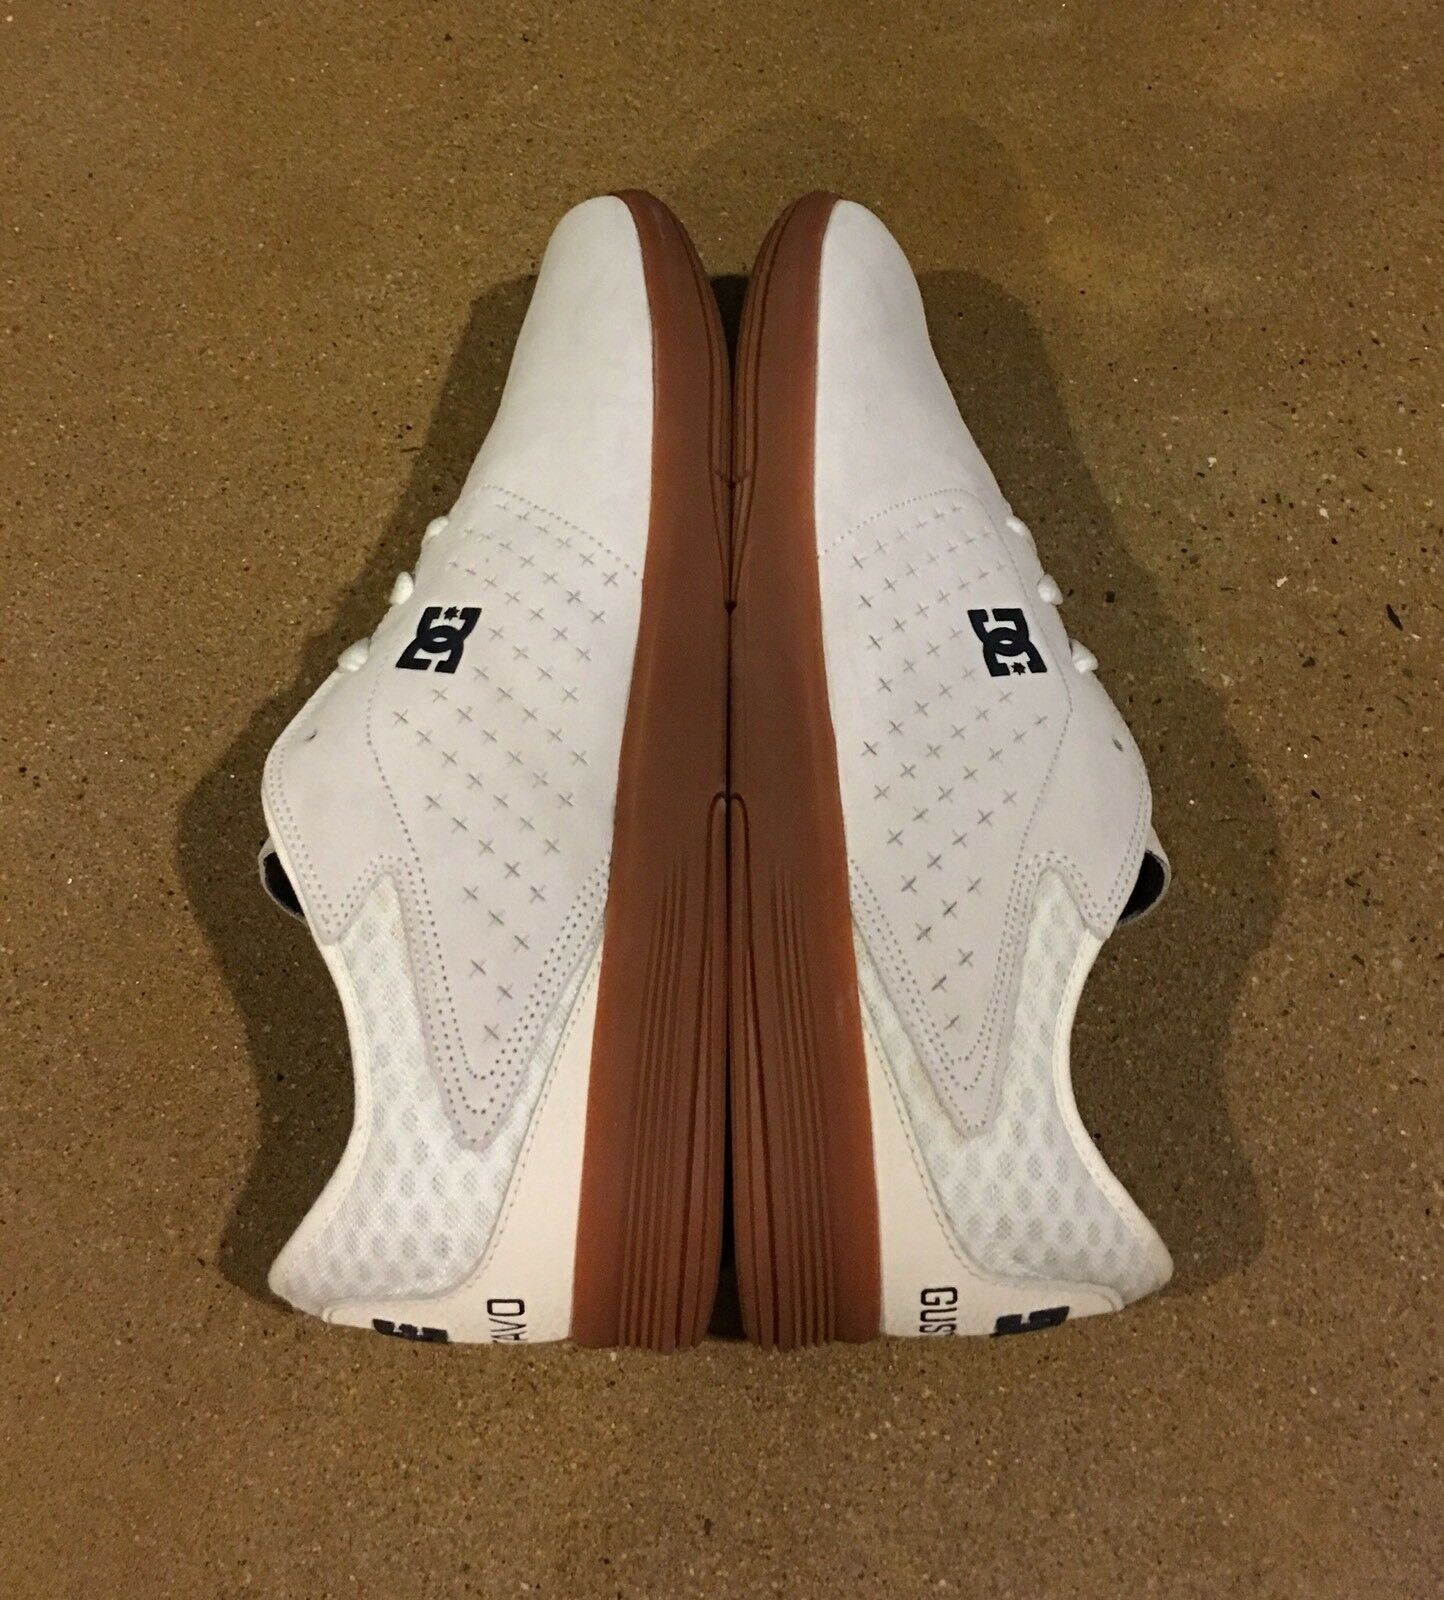 DC New Jack S Felipe Gustavo Men's Skate Größe 14 US BMX Skate Men's Schuhes Sneakers Deadstock 0d89b3